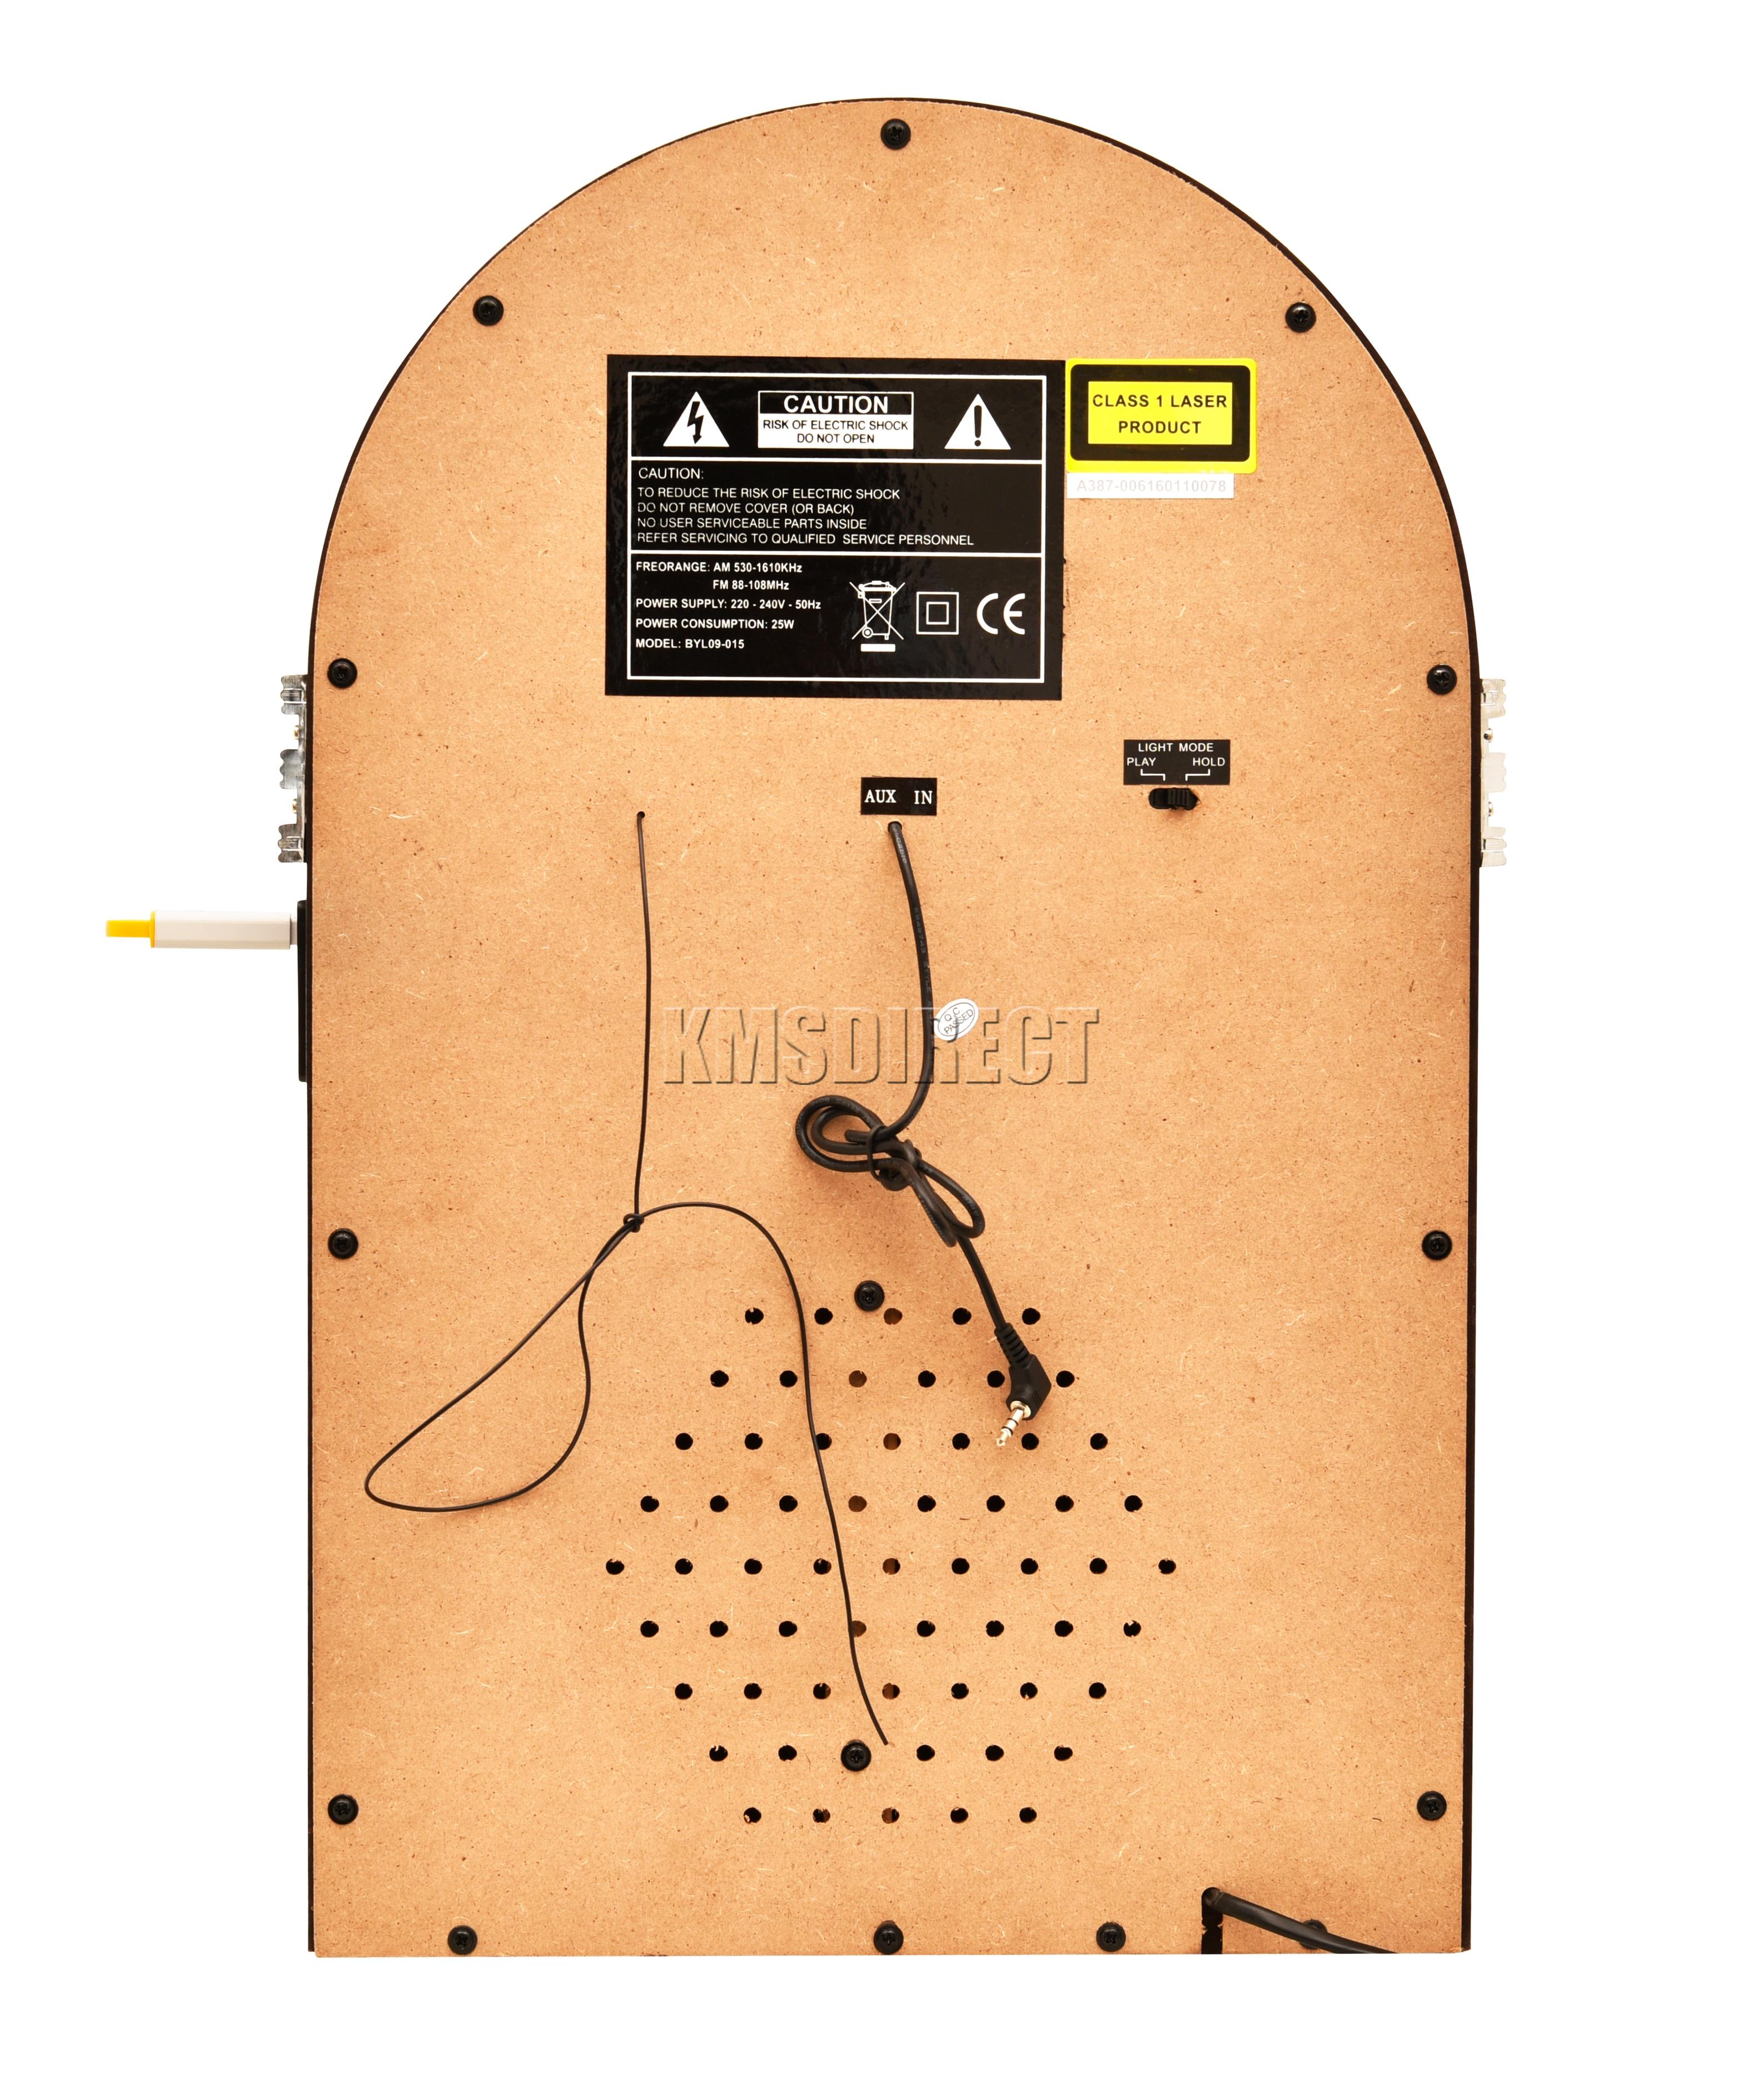 foxhunter jukebox stereo mp3 cd player usb aux sd fm radio. Black Bedroom Furniture Sets. Home Design Ideas